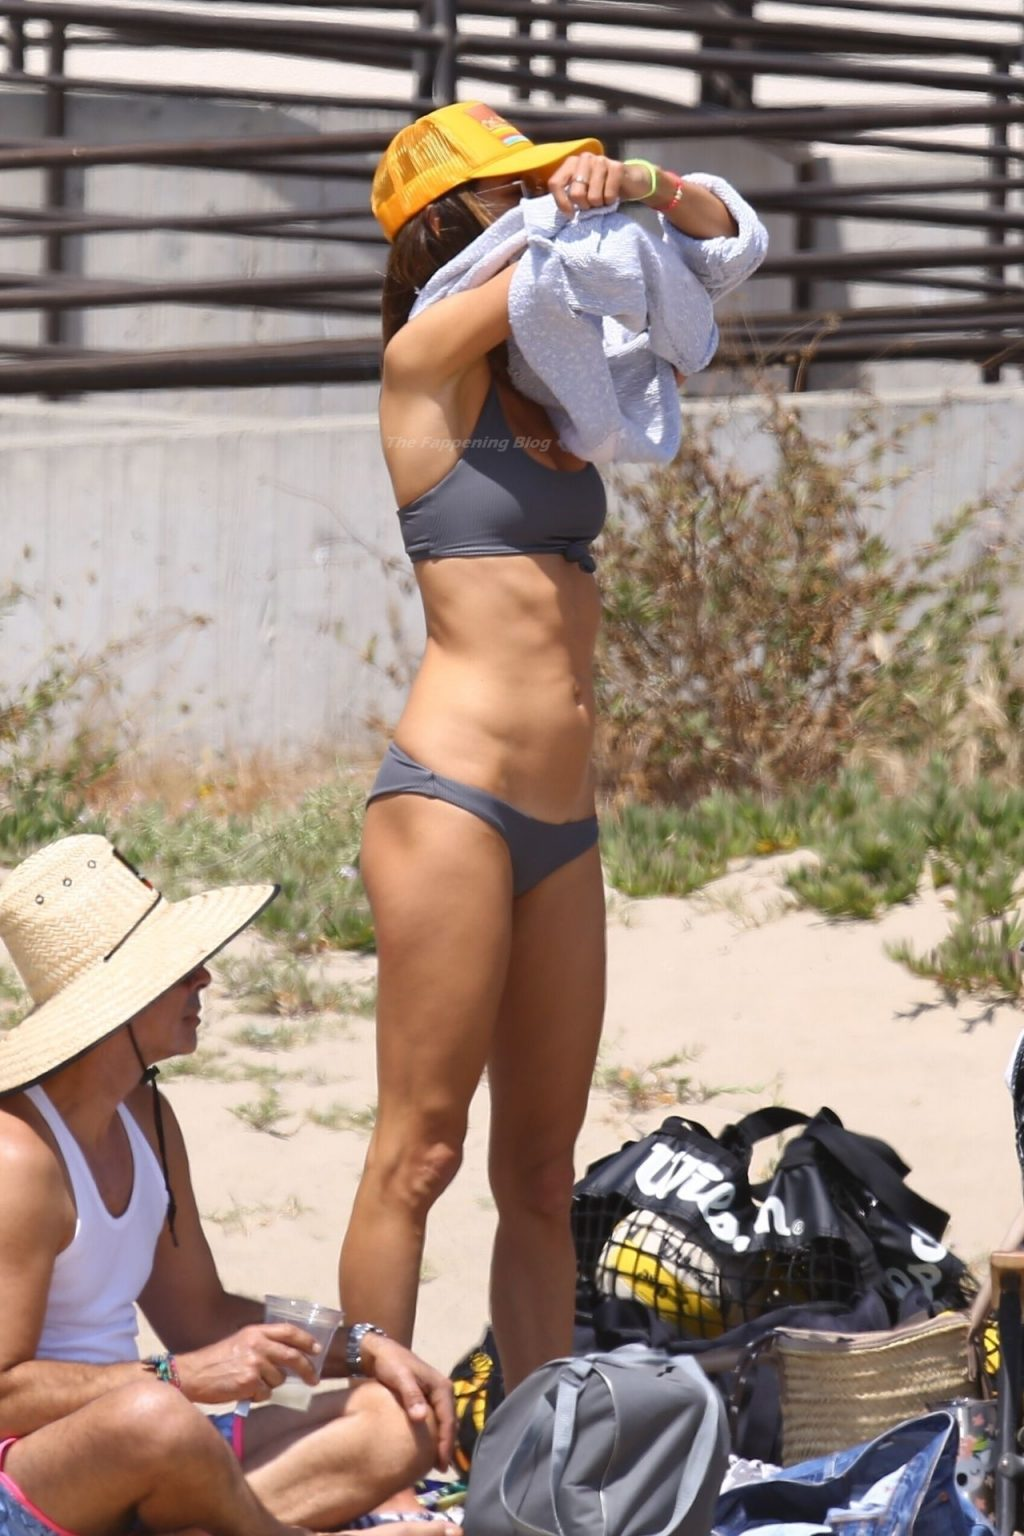 Alessandra Ambrosio Flashes Her Bush on the Beach in Malibu (62 Photos)